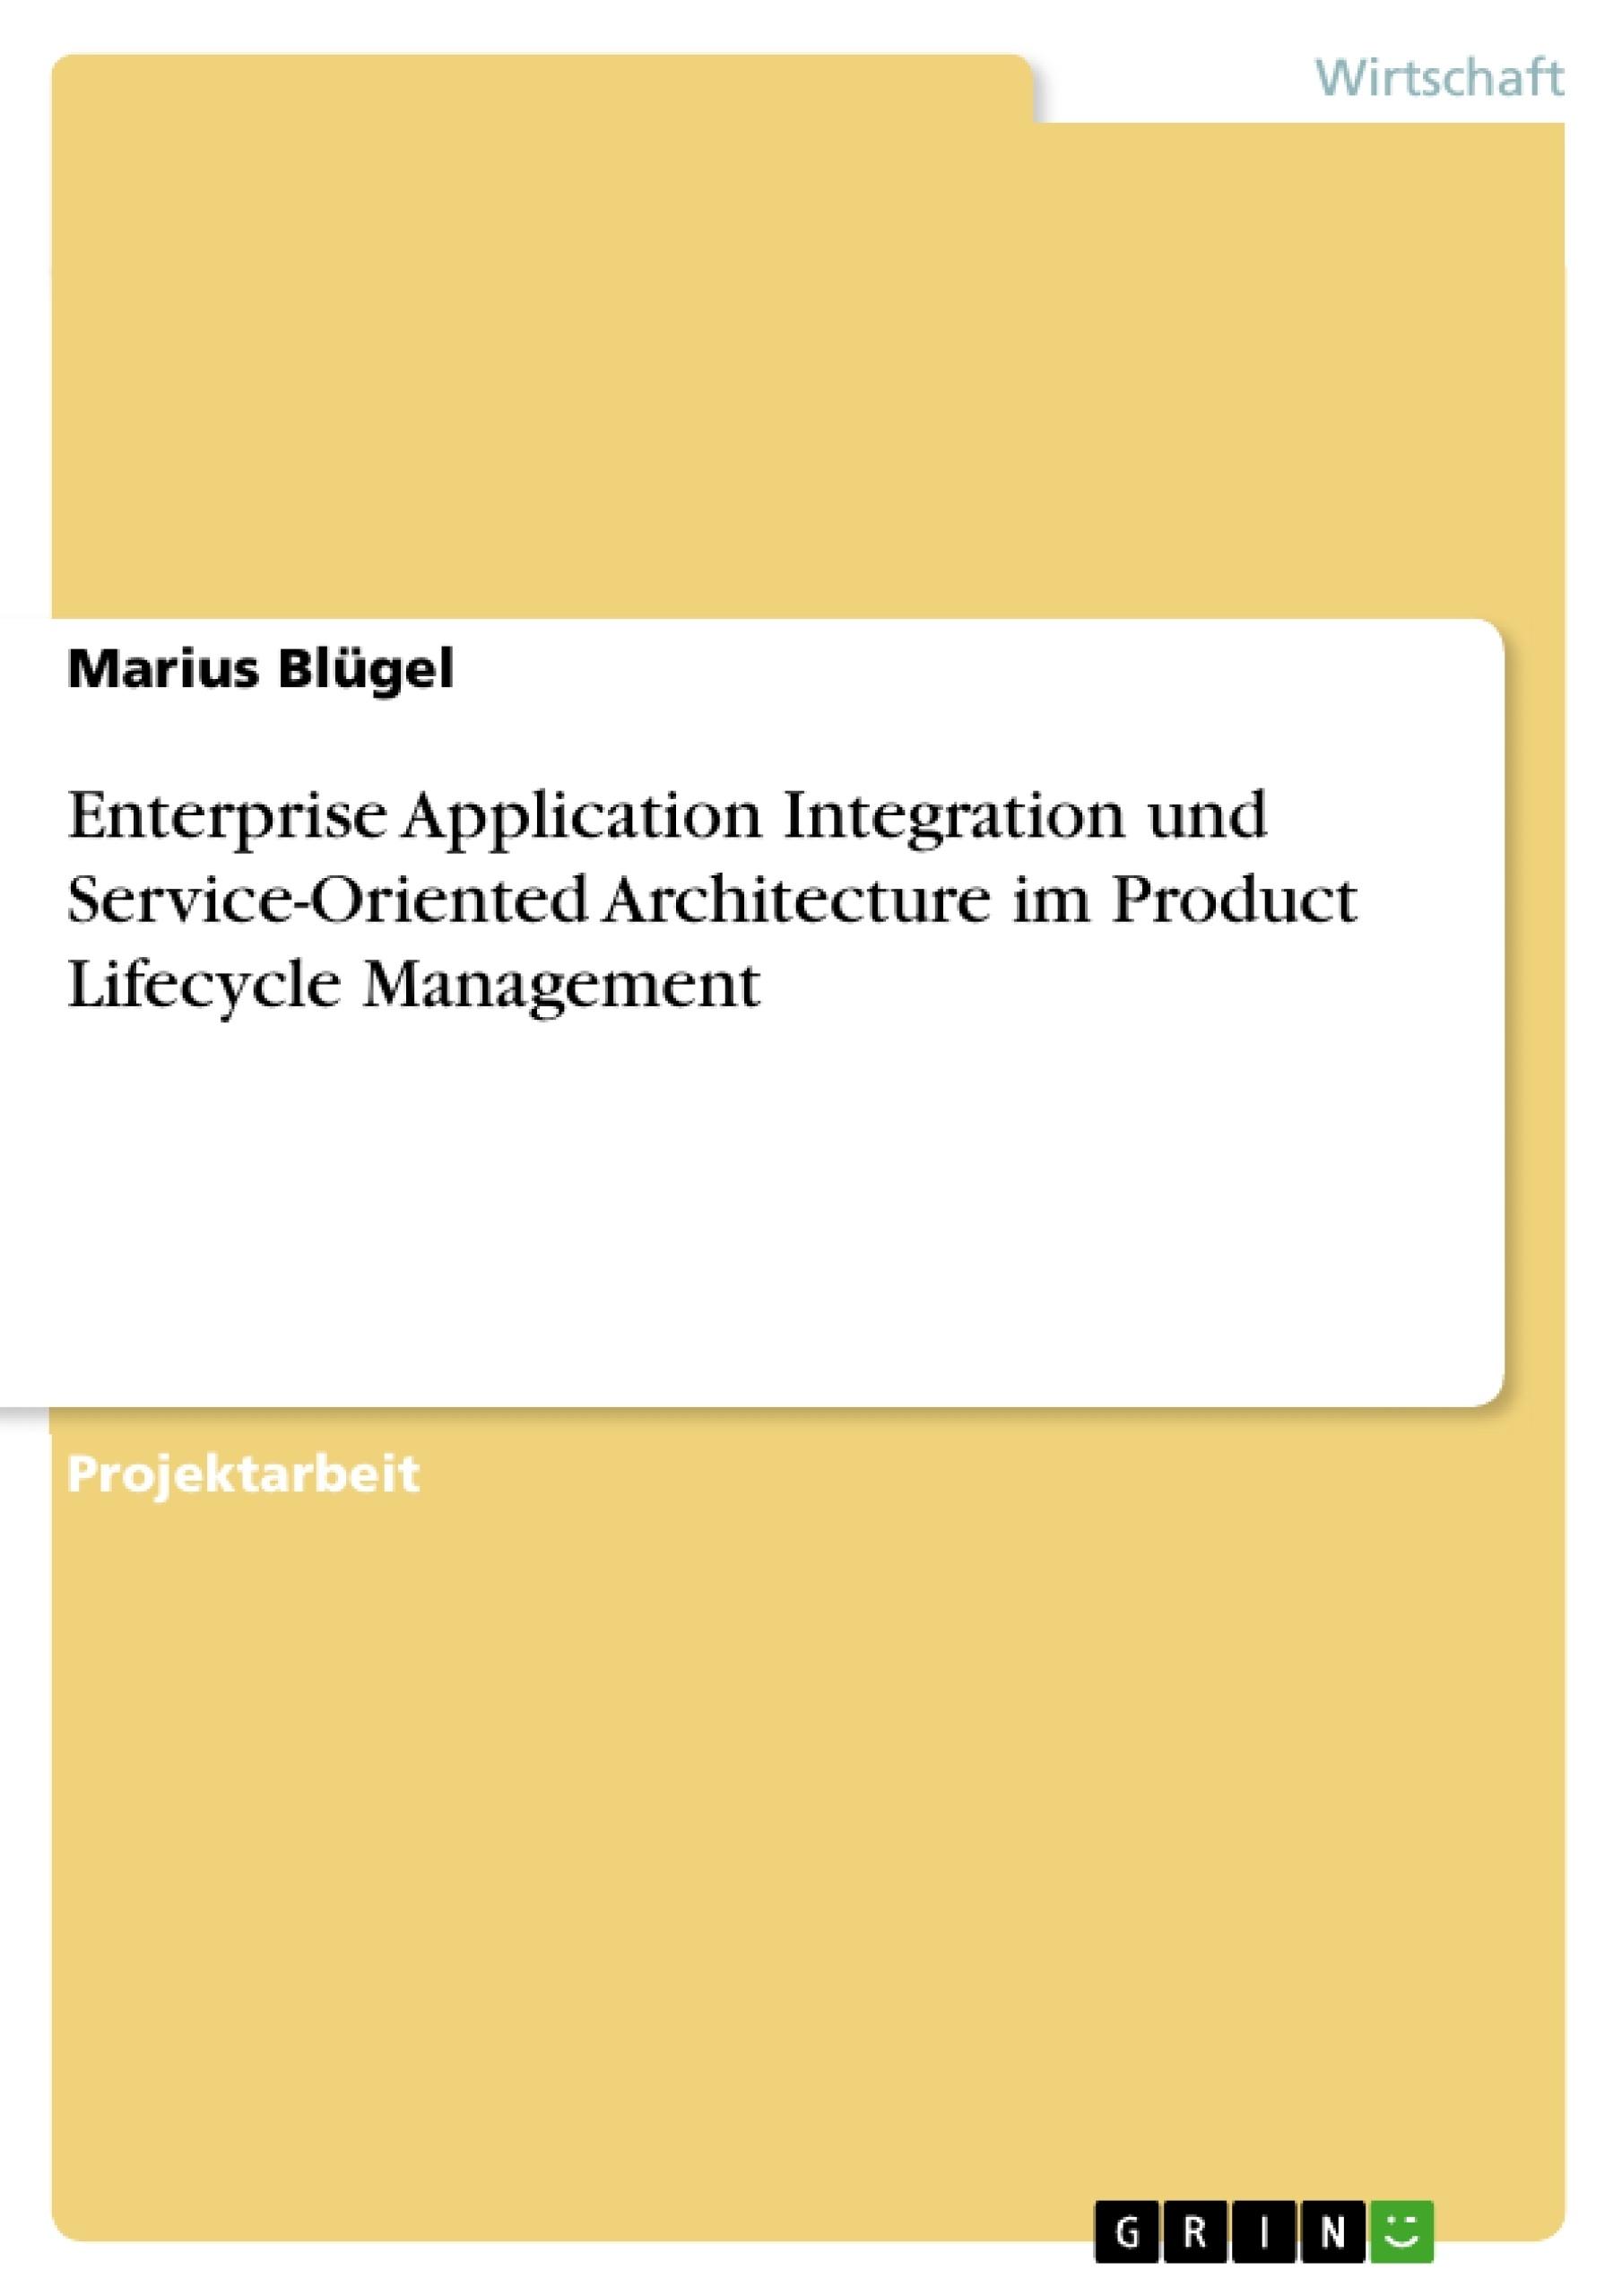 Titel: Enterprise Application Integration und Service-Oriented Architecture im Product Lifecycle Management